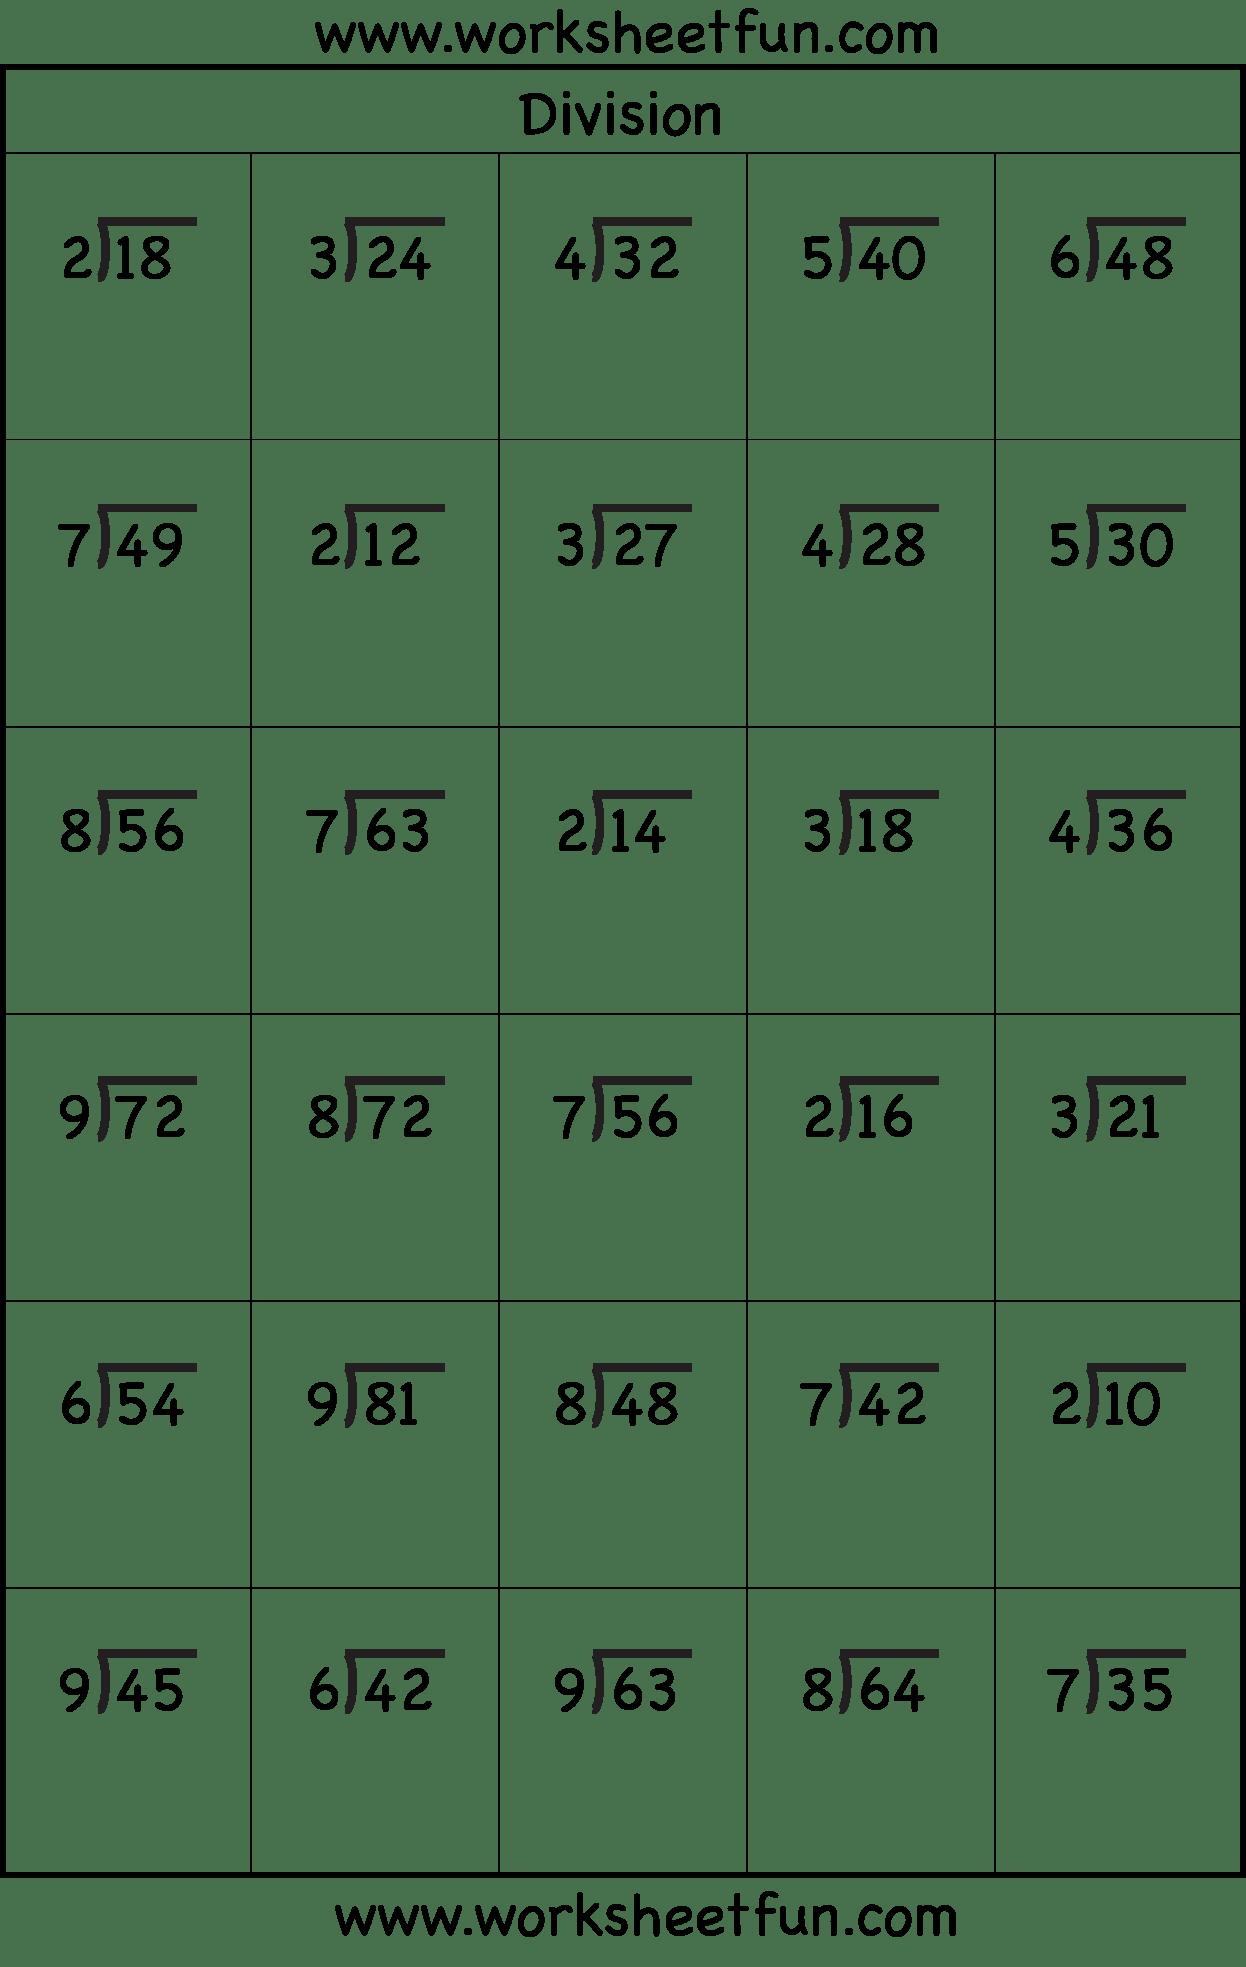 10 3rd Grade Math Worksheets - #Worksheet Template   Math division  worksheets [ 1967 x 1246 Pixel ]